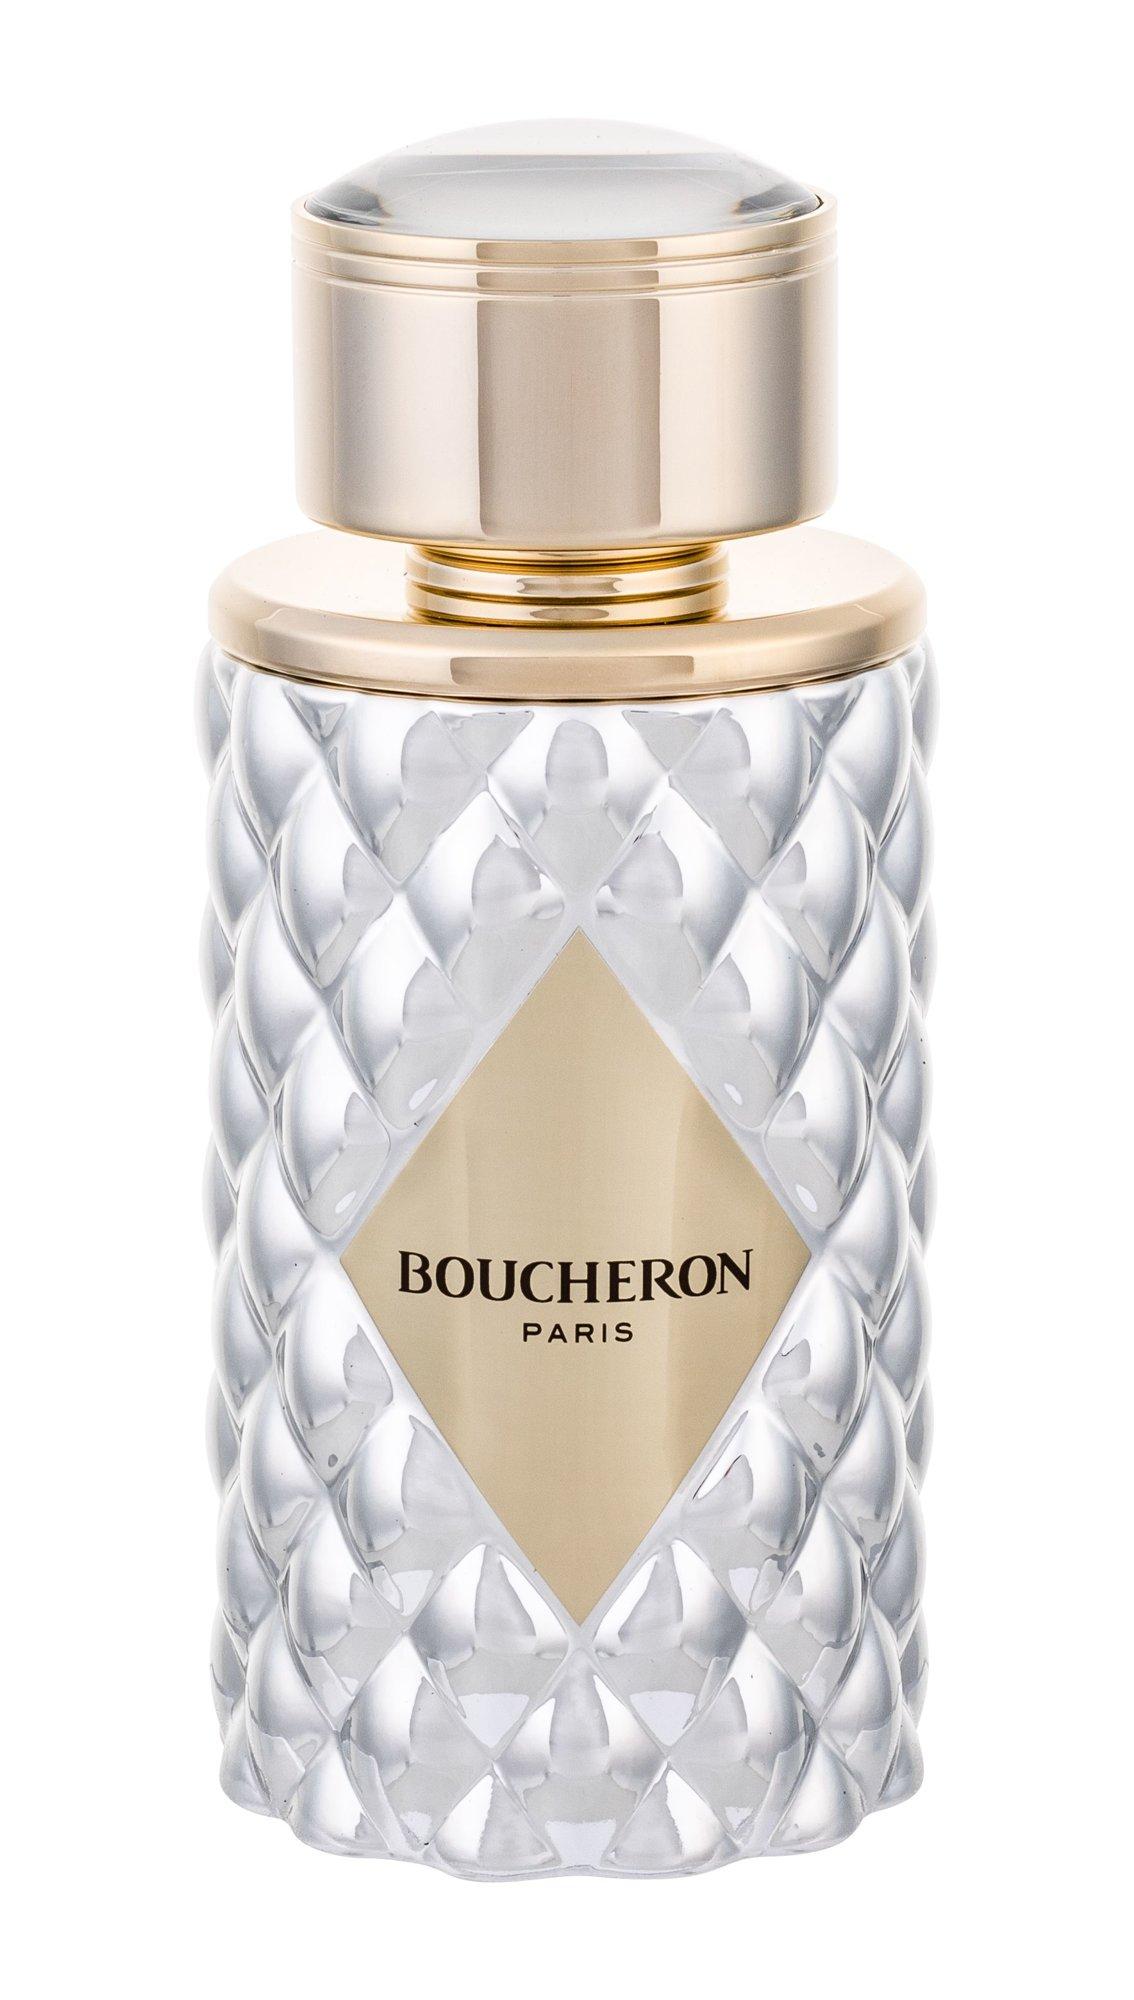 Boucheron Place Vendome EDP 100ml  White Gold